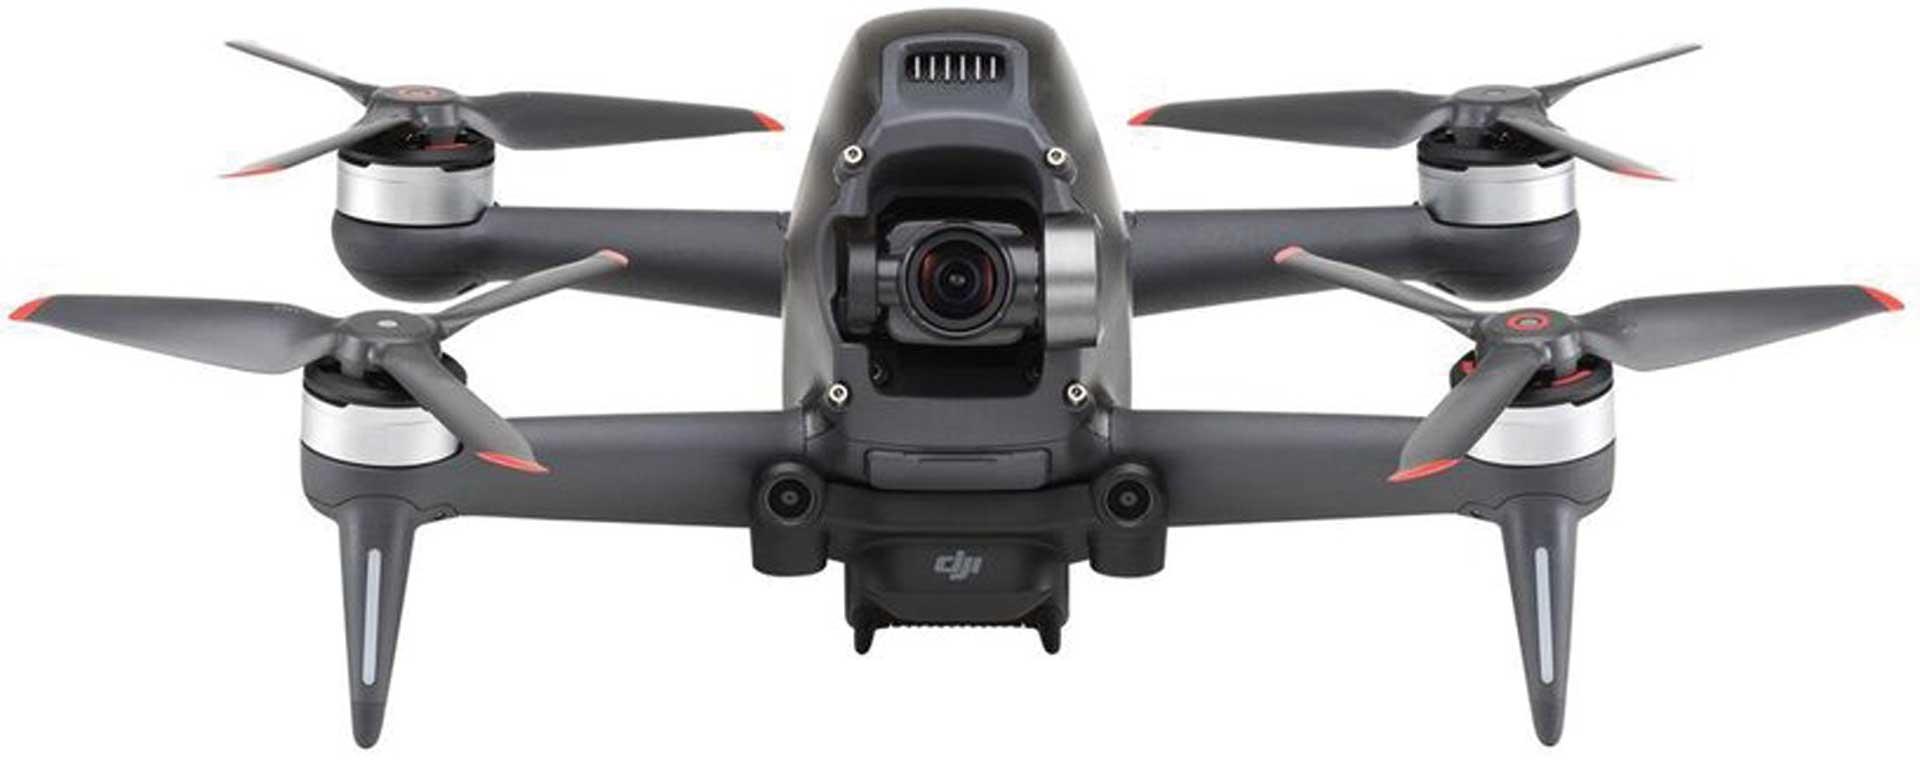 DJI FPV Drohne (Universal Edition)